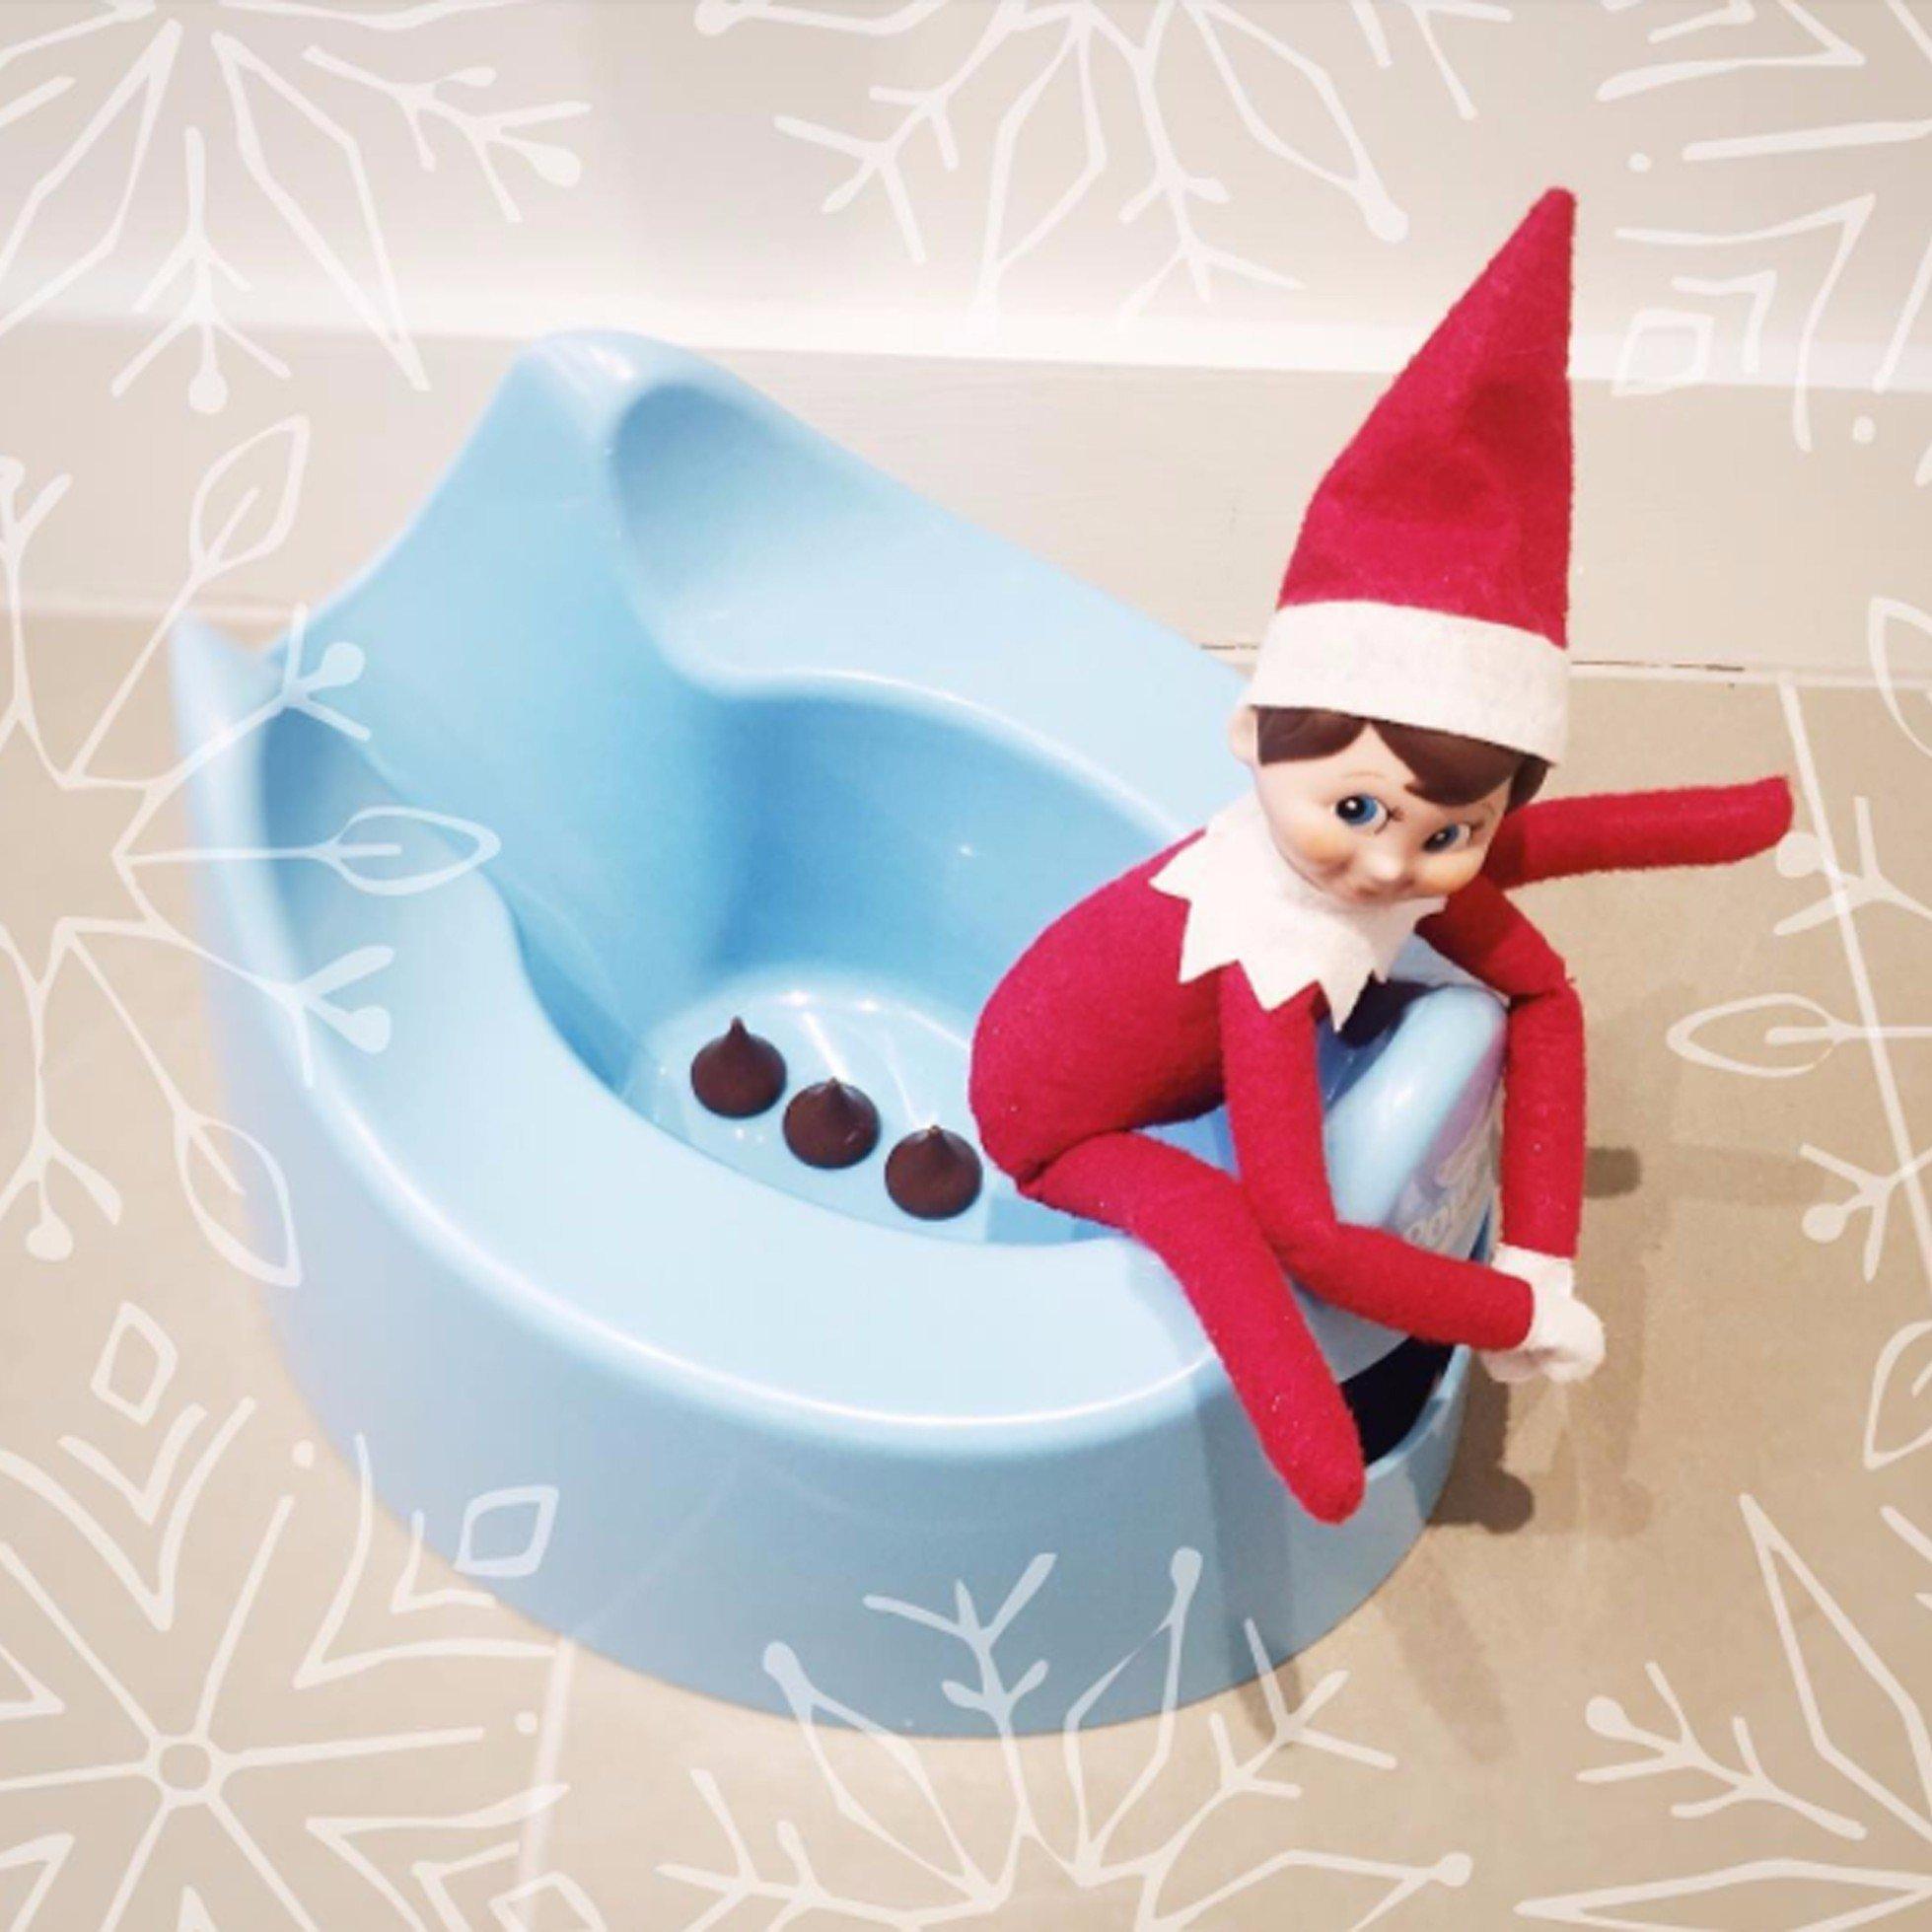 10 Most Popular Best Elf On A Shelf Ideas funny elf on the shelf ideas popsugar smart living uk 2020